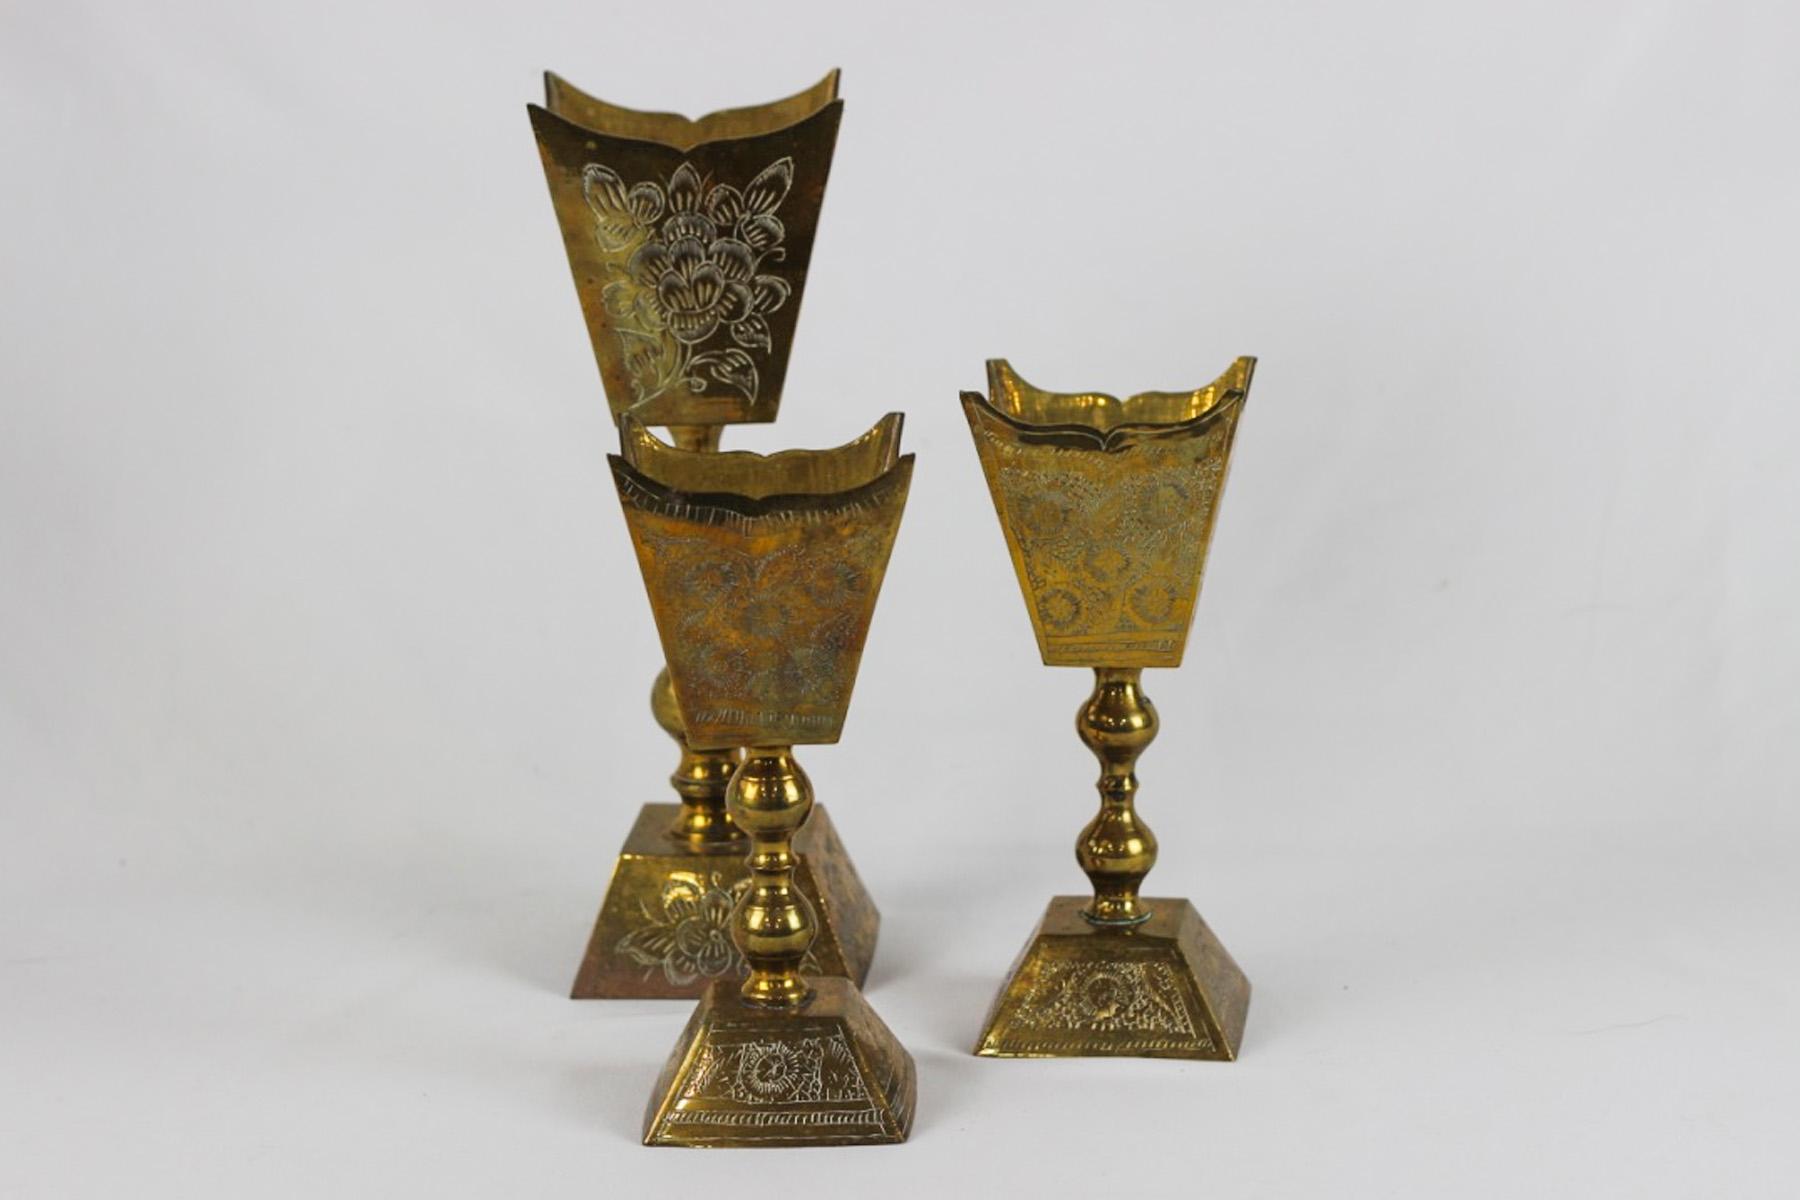 Tall Brass Vases - Scavenged Vintage Rentals